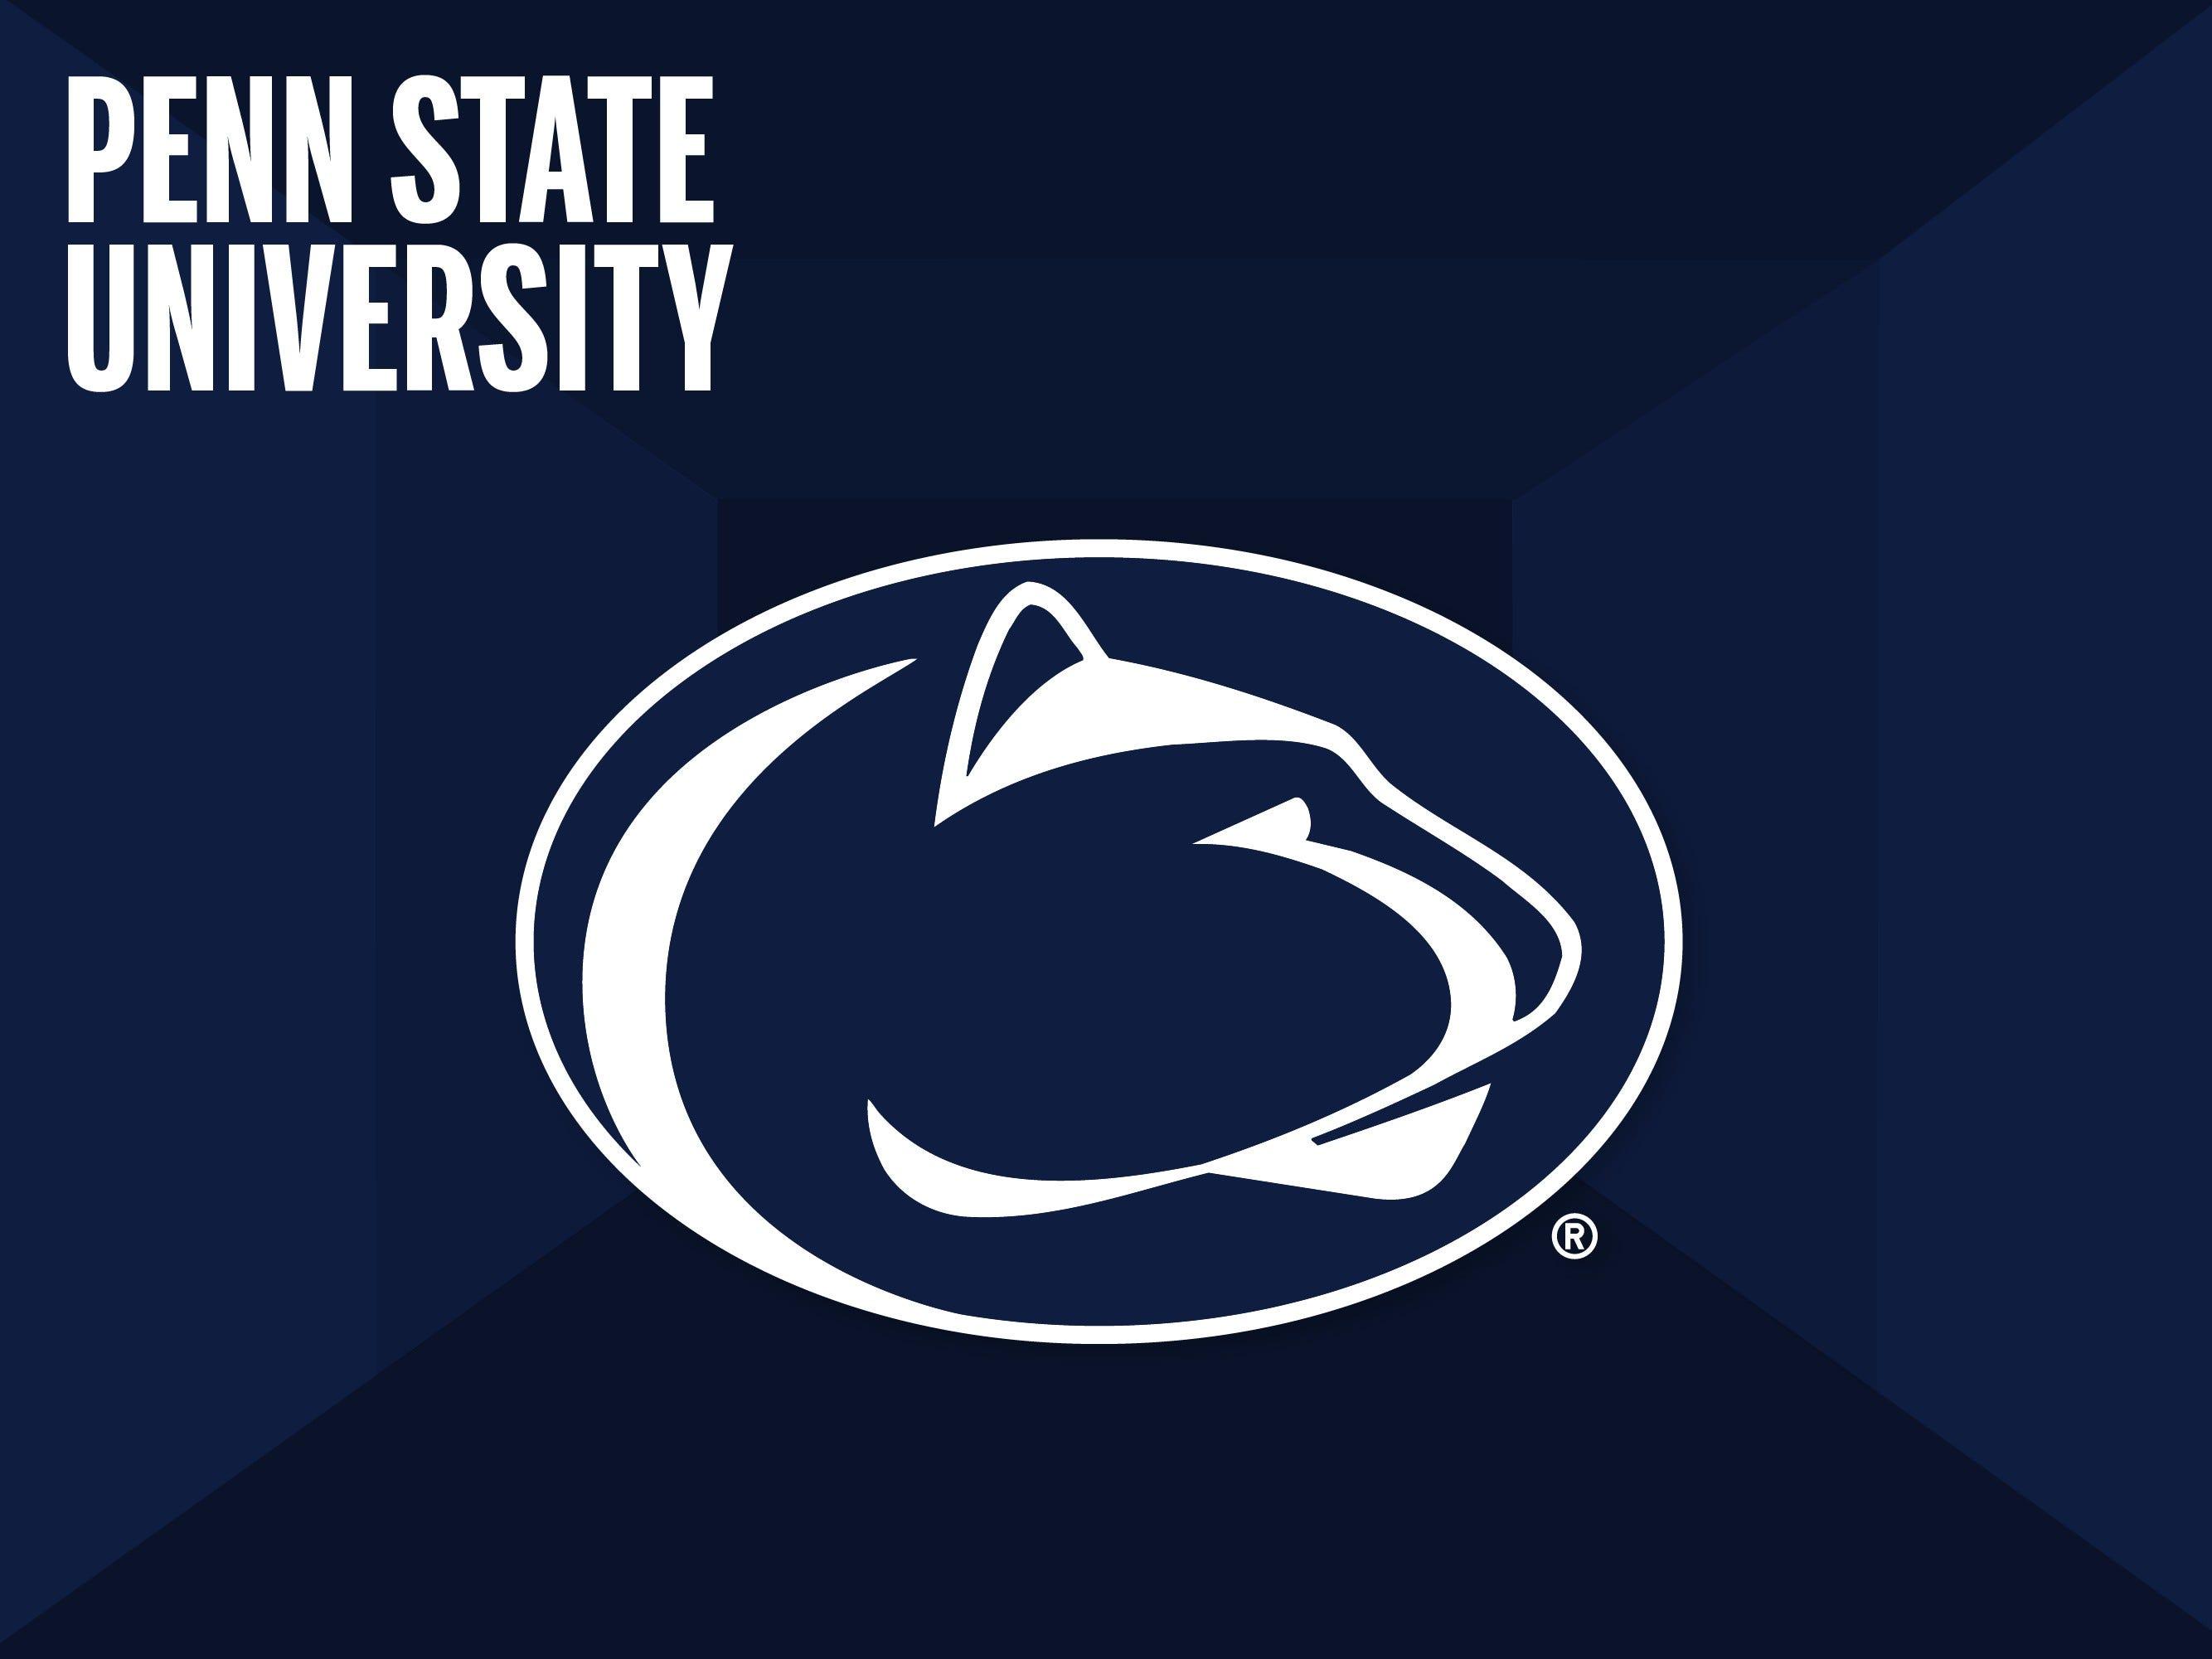 Penn State University College Football Shop